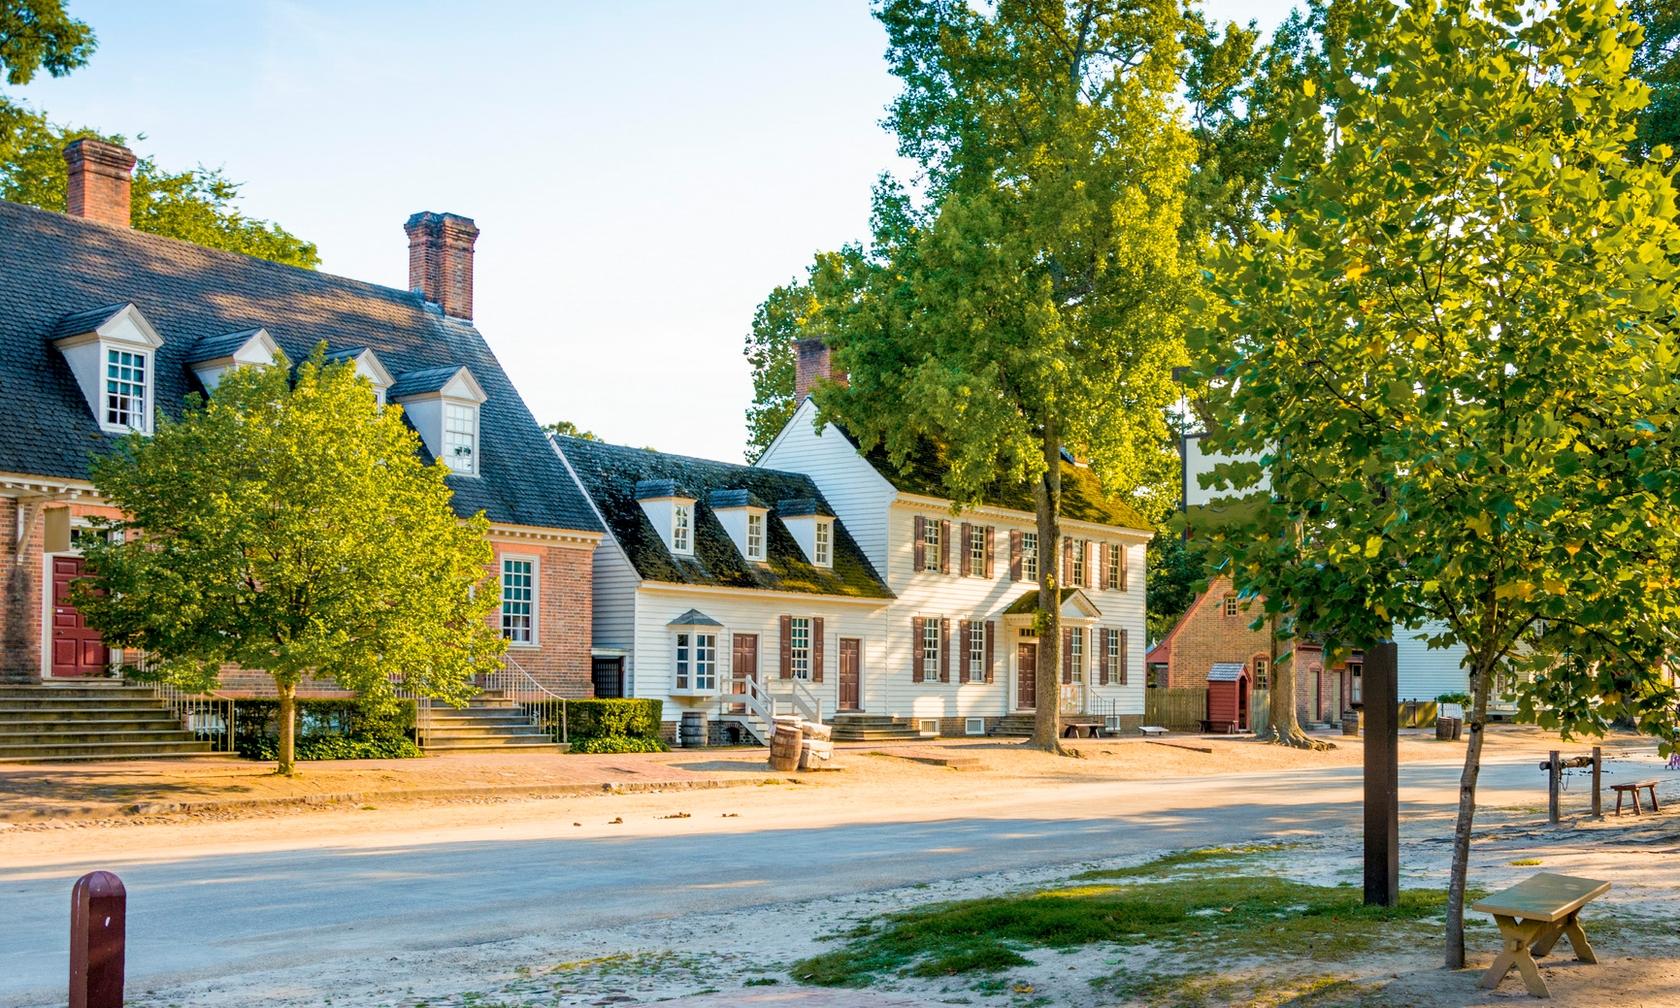 Vacation rentals in Williamsburg